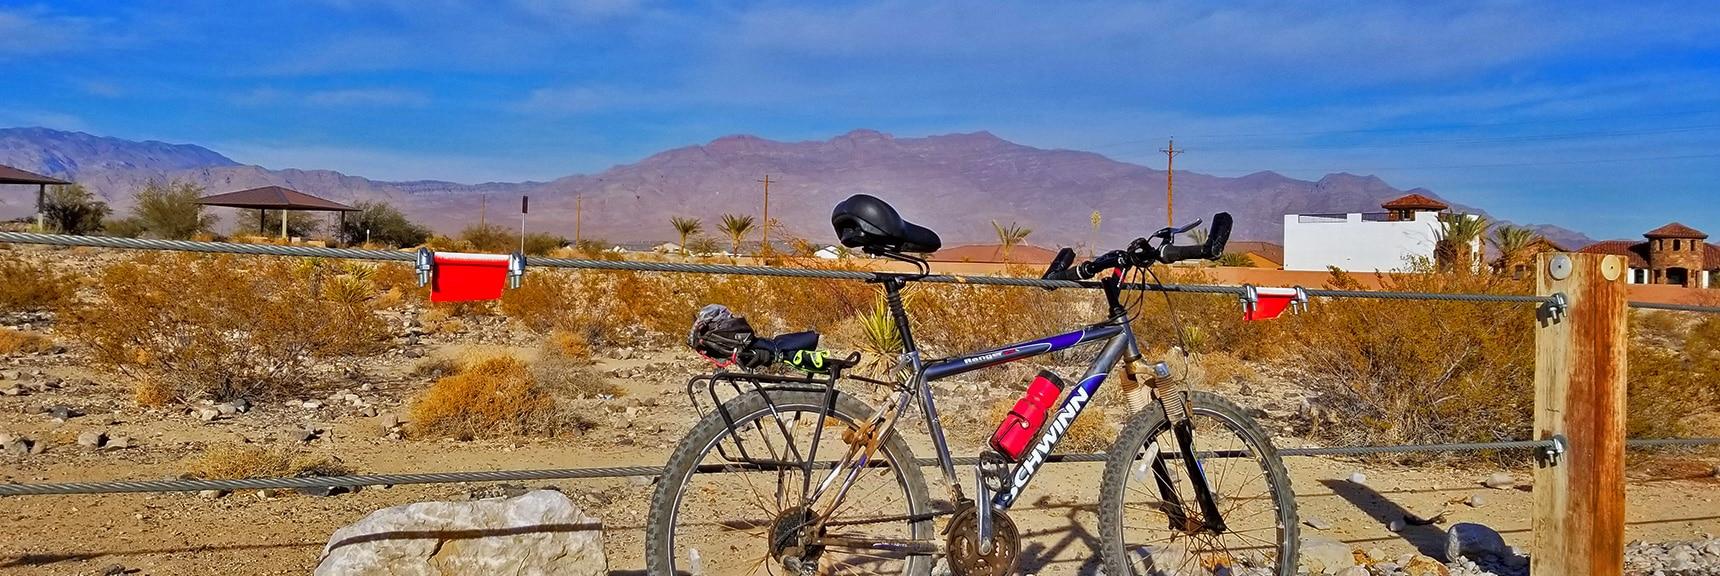 Trails Area at Southern Floyd Lamb Park on Rachel | Snapshot of Las Vegas Northern Growth Edge on January 3, 2021